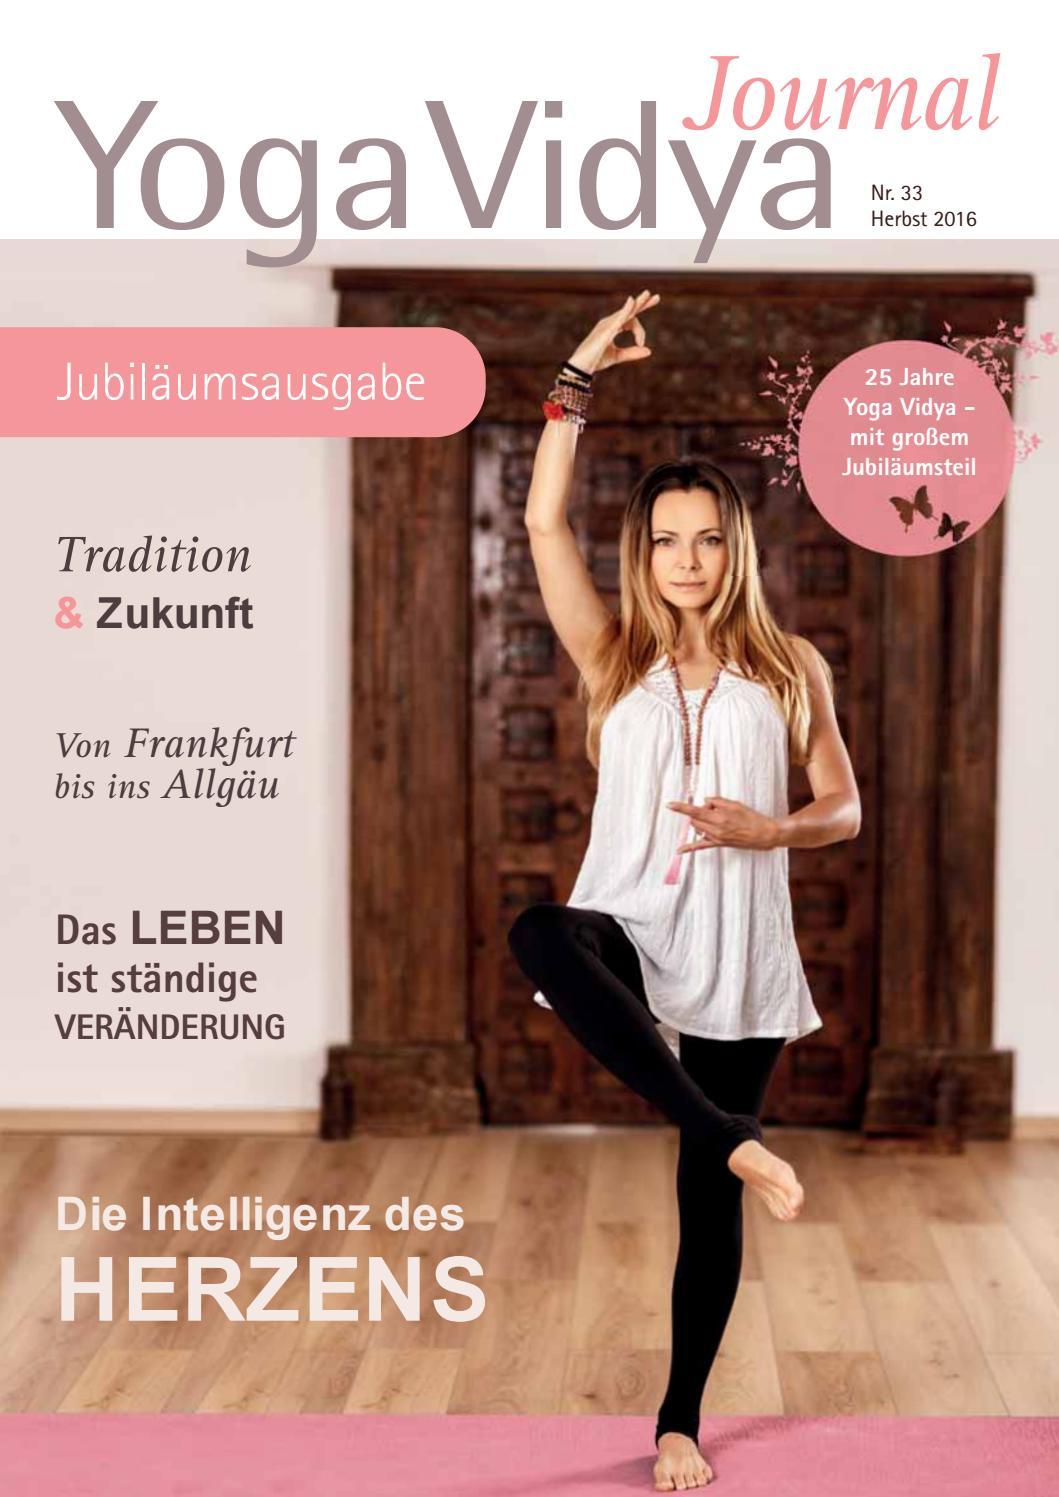 Yoga Vidya Journal Nr 33 Jubilaumsausgabe Herbst 2016yoga Vidya Journal Nr33 By Yoga Vidya Issuu